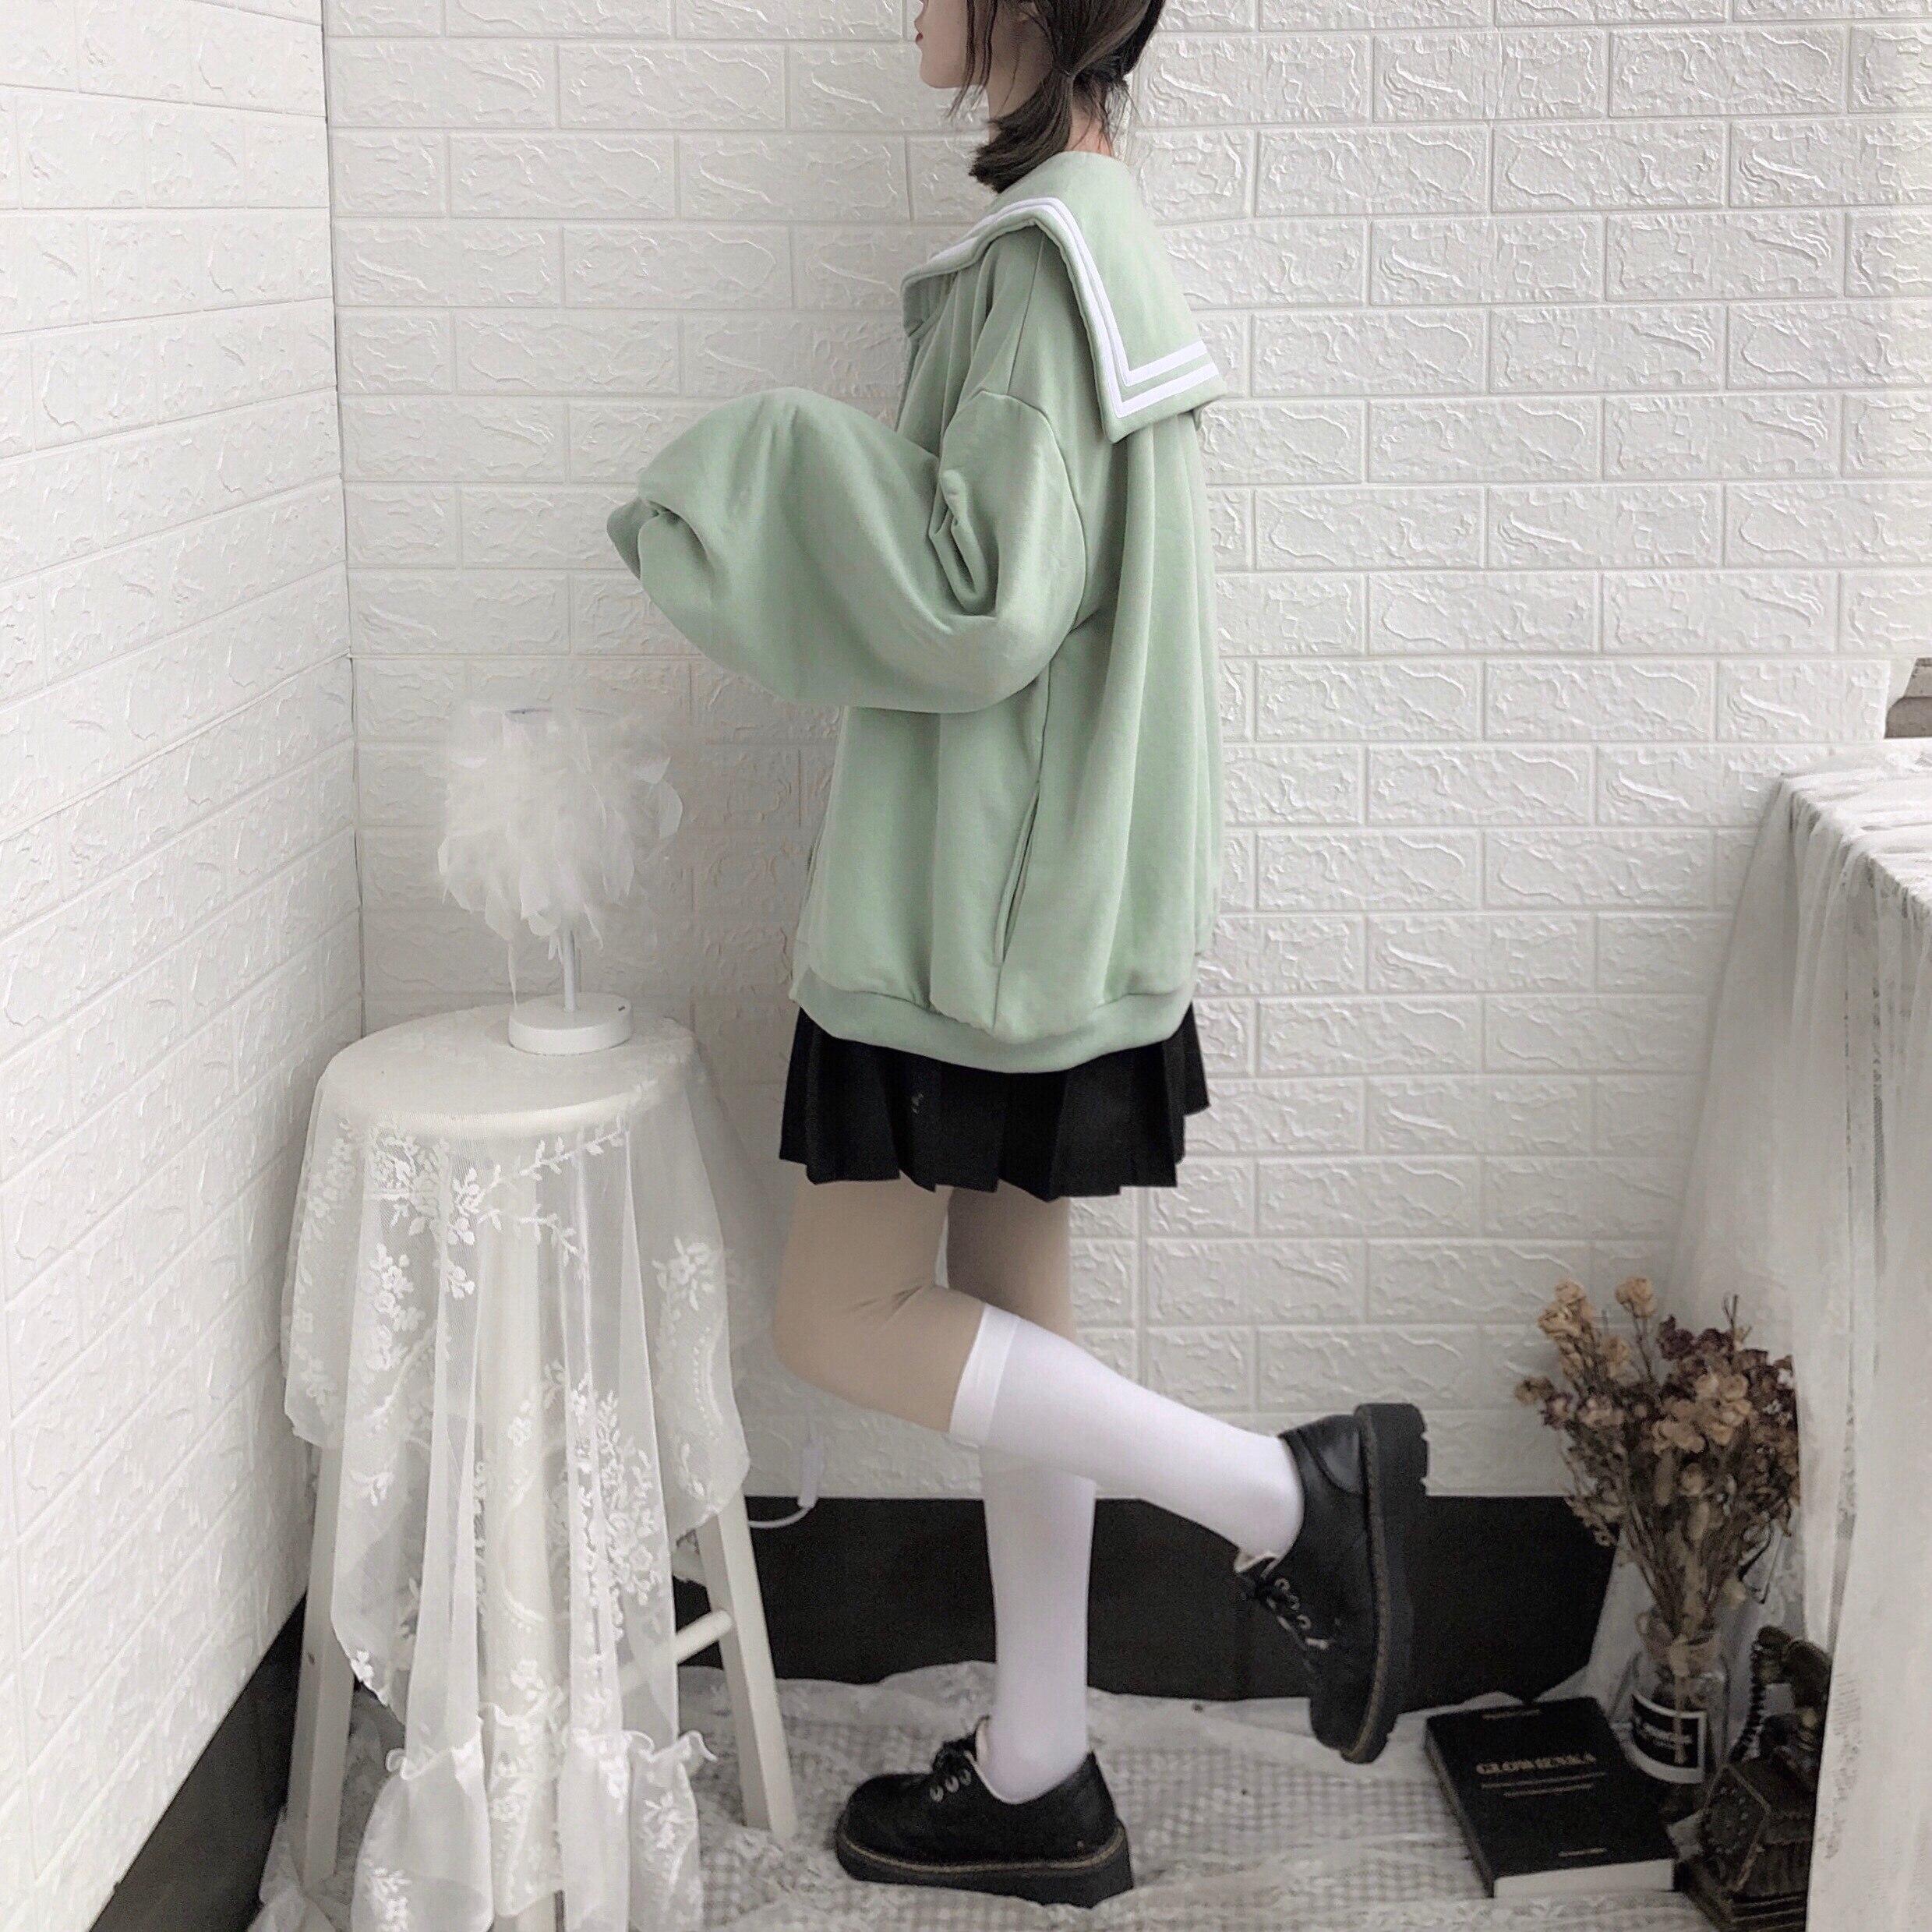 Image 3 - Winter Kawaii Sweet Girls Oversized Hoodie Soft Sister Sailor  Collar Sweatshirt Women Japanese Zipper Outerwear Coat Black  BlueHoodies